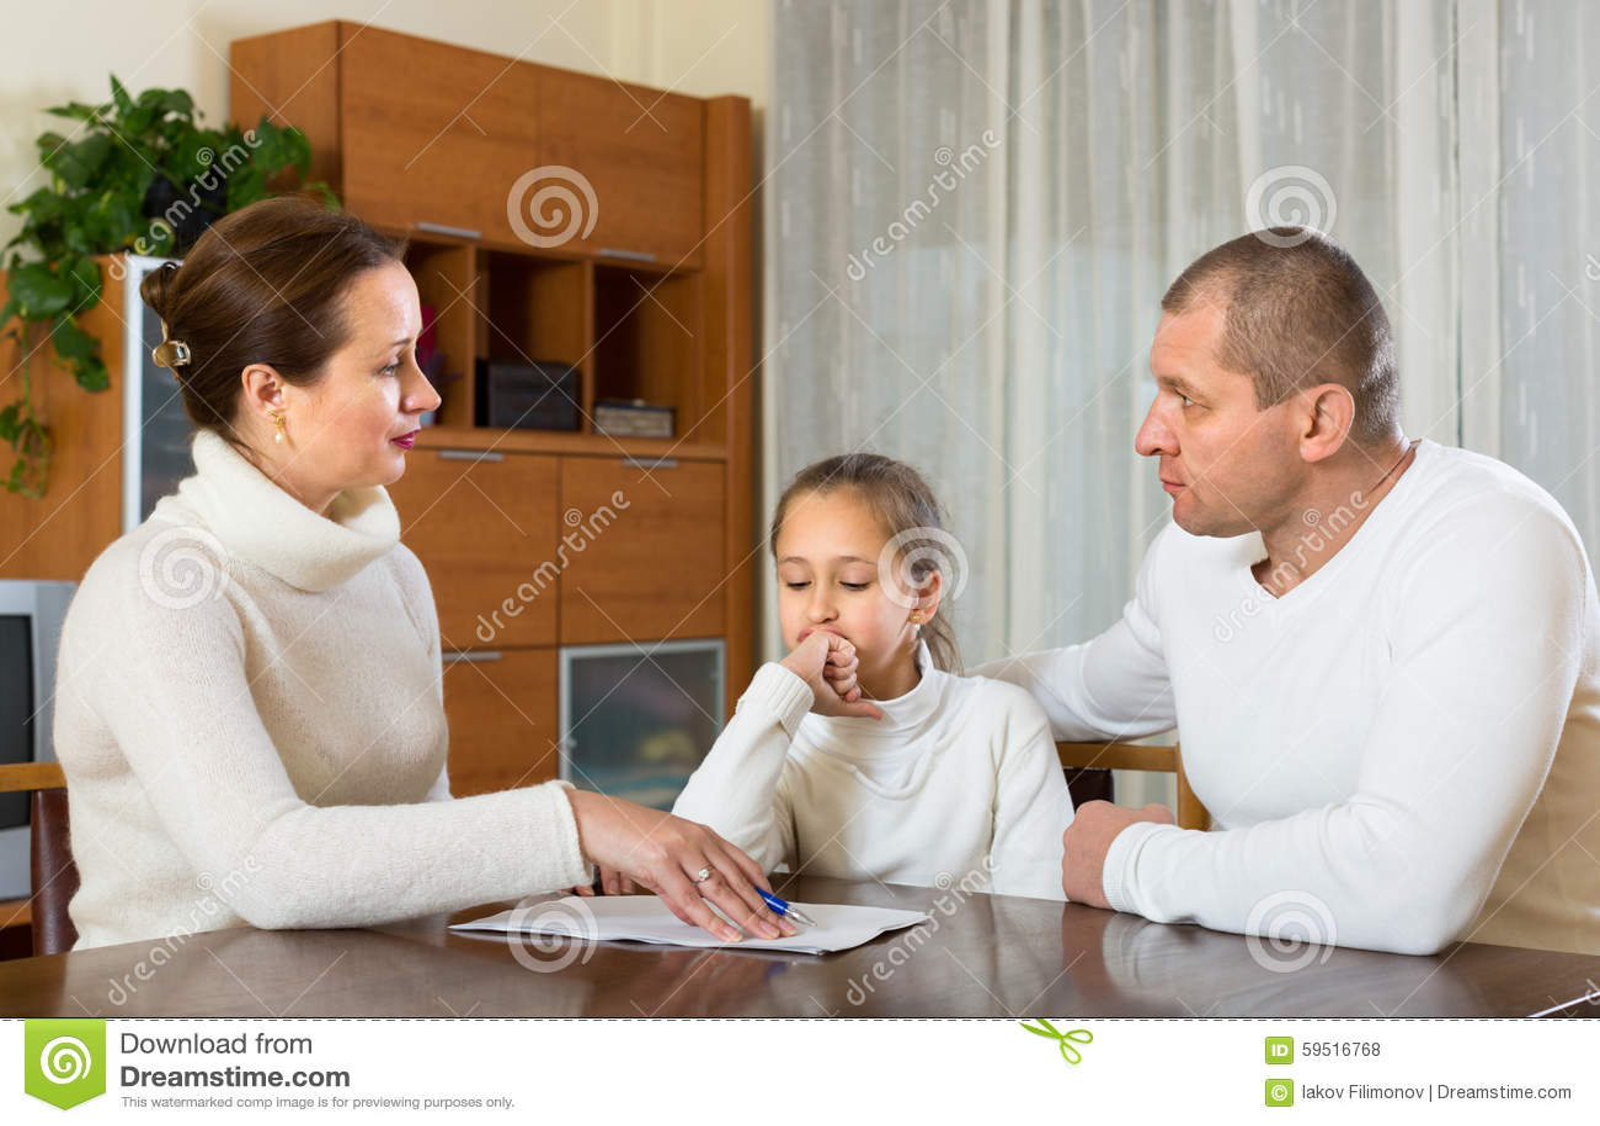 Sad family having financial problems